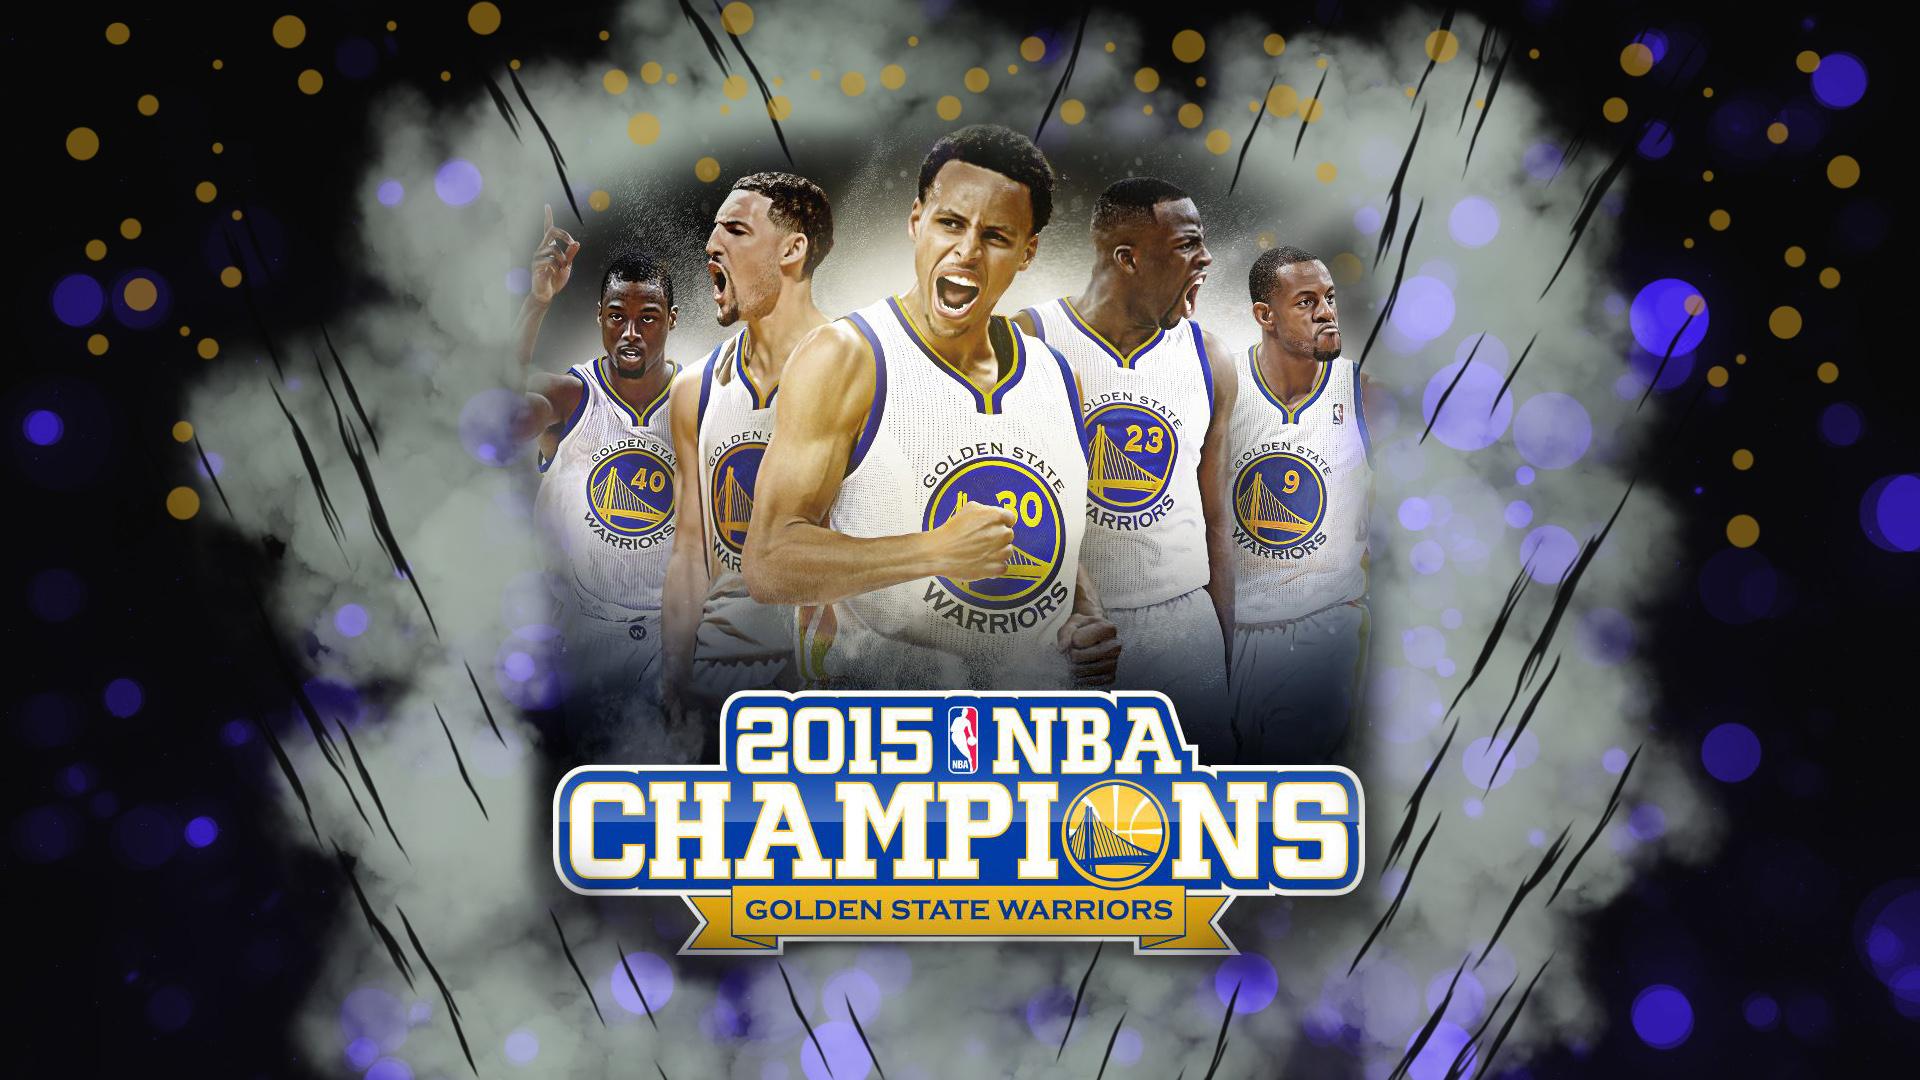 Klay Thompson Wallpapers | Basketball Wallpapers at ...